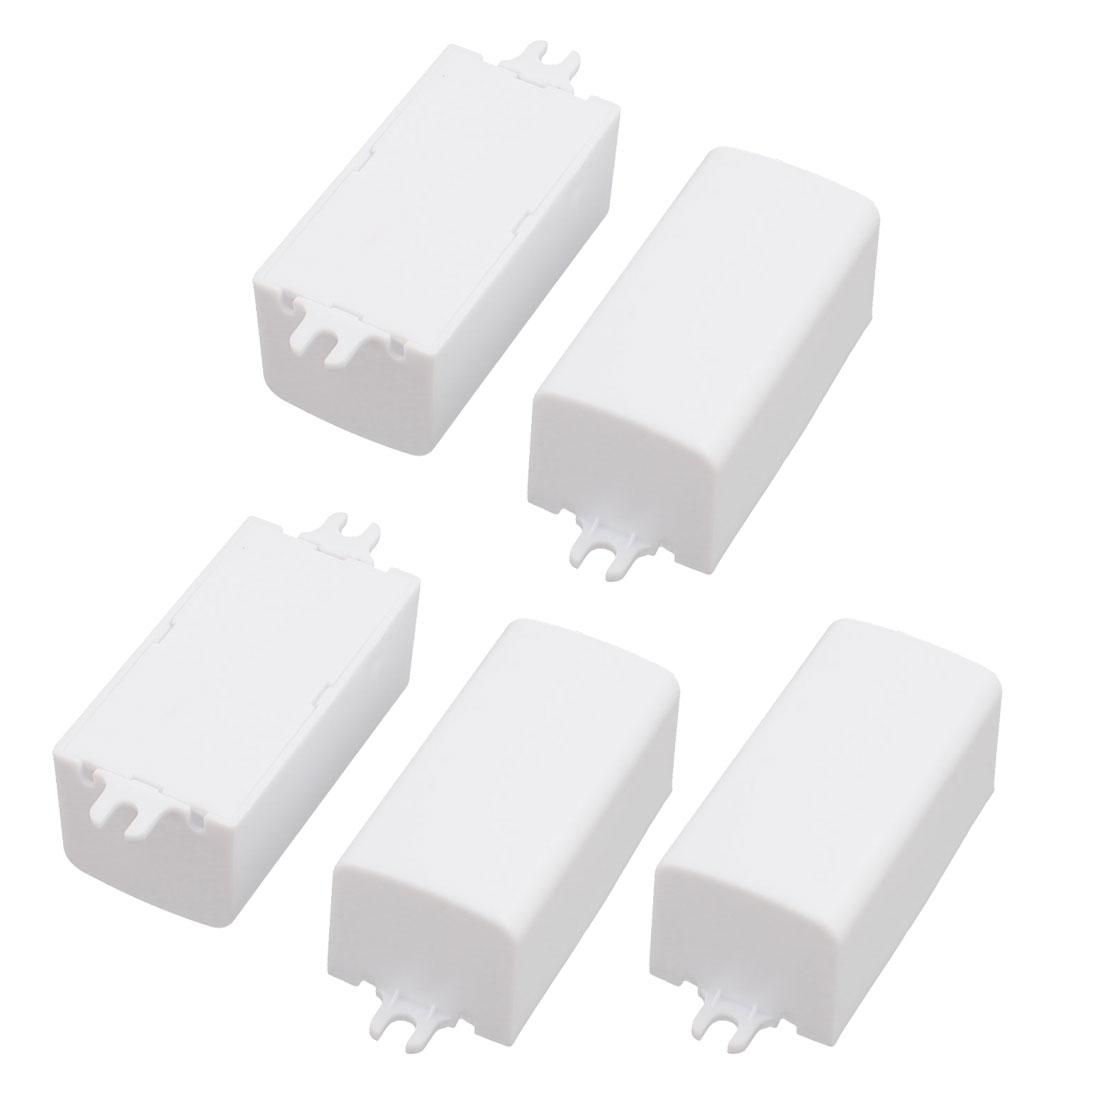 5 Pcs XL111 53x27x23mm PC Flame Retardant Enclosure Junction Box for LED Driver